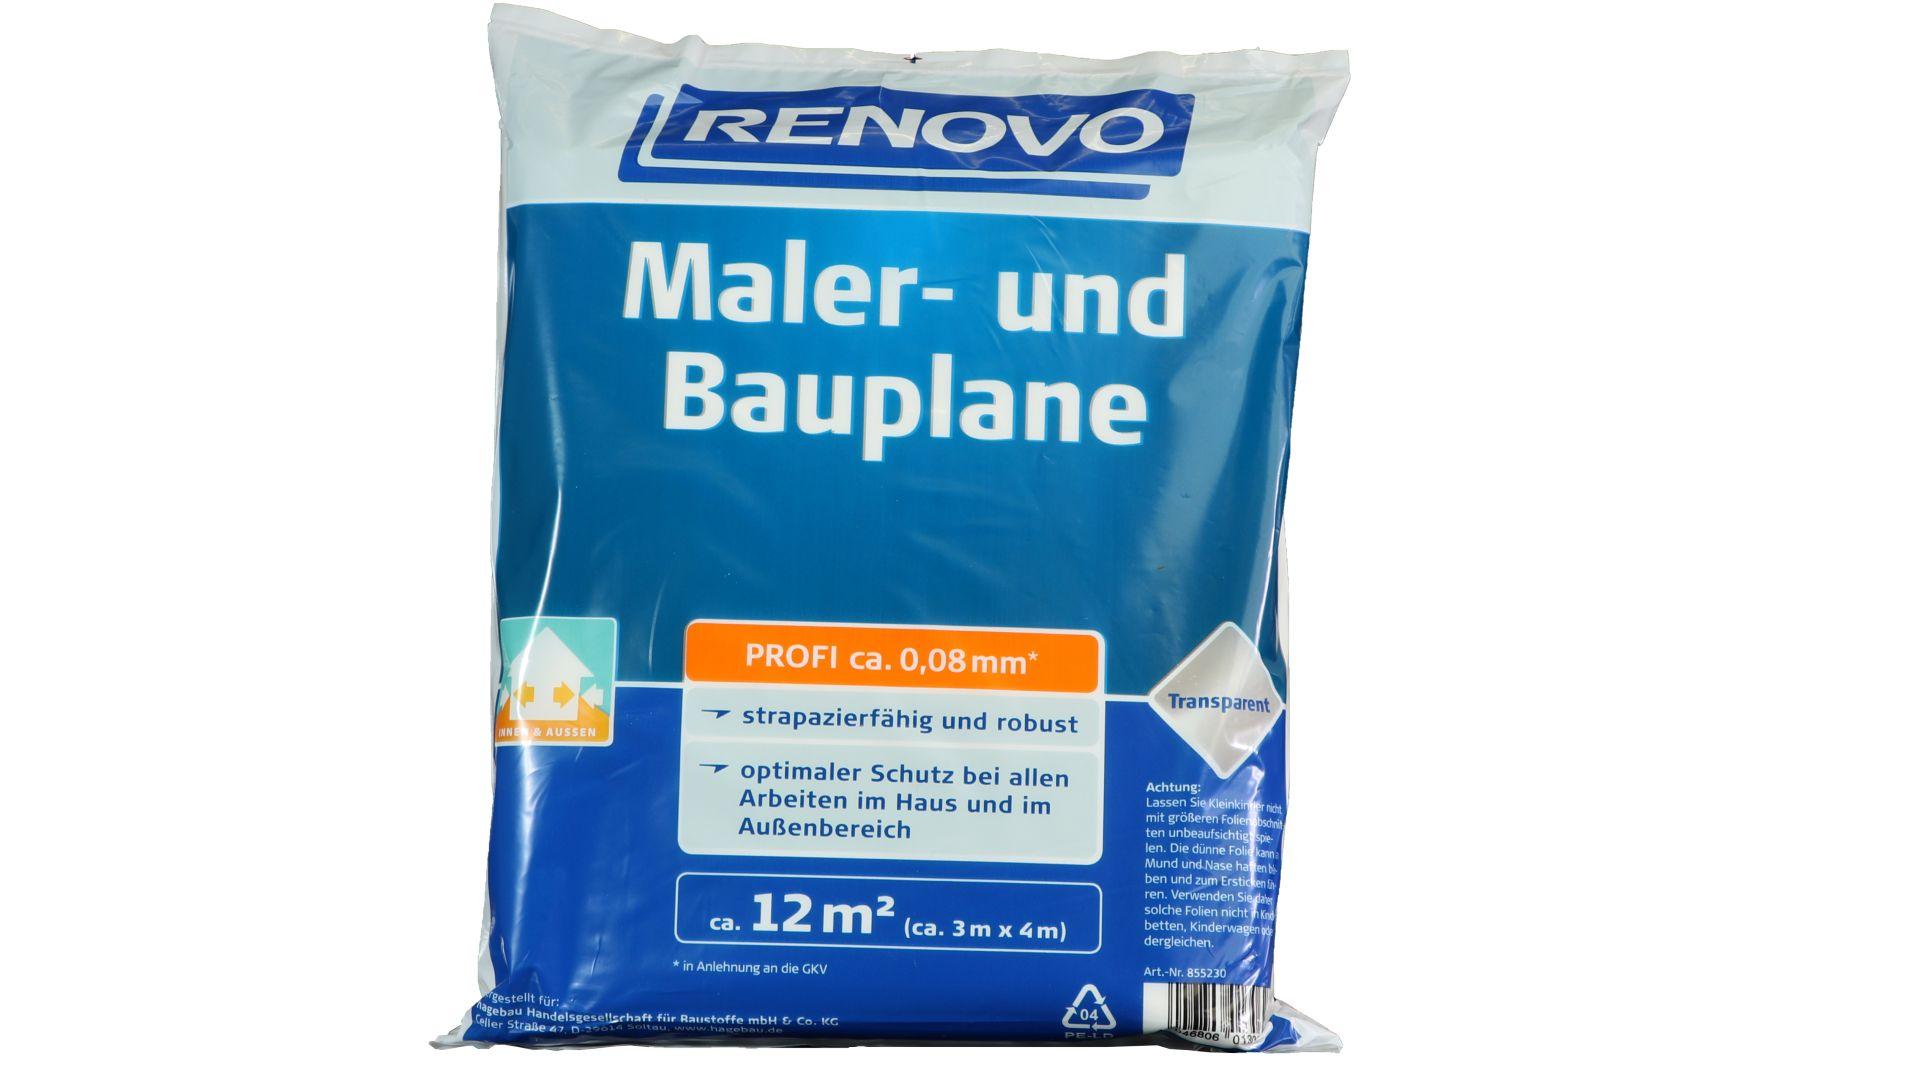 RENOVO Maler- und Bauplane Profi, transparent, 4 x 3 m x 80 µm